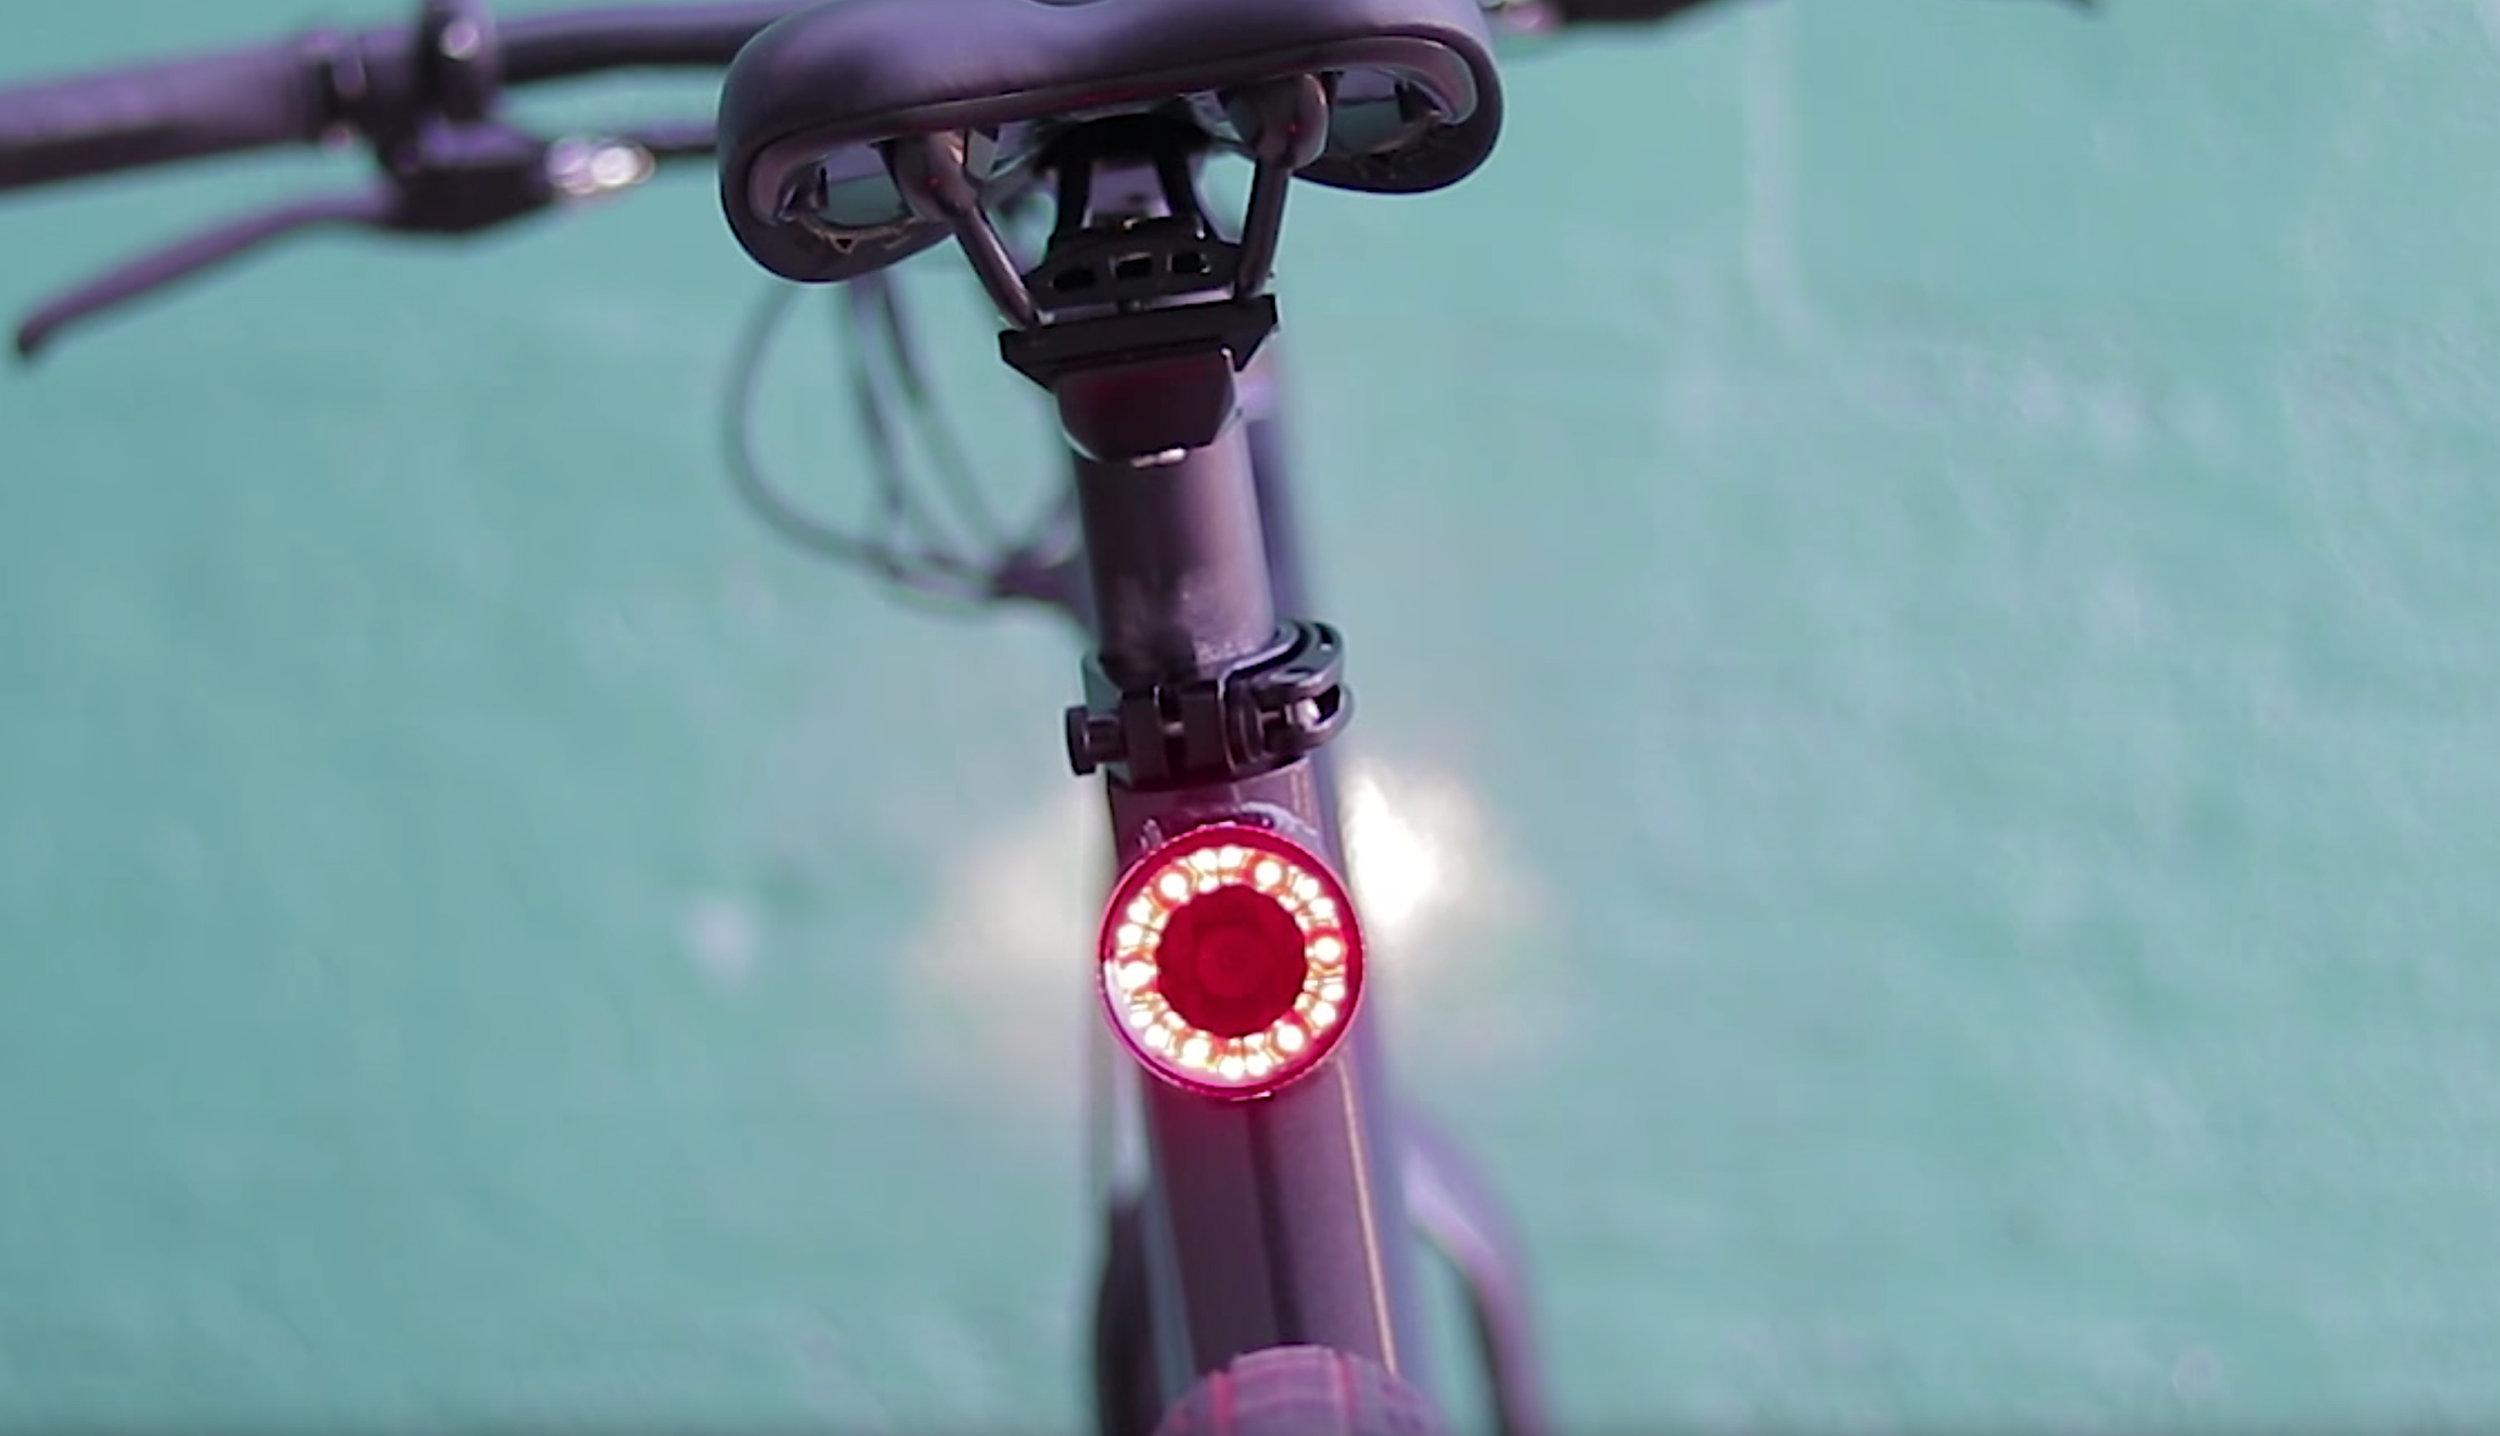 electrified-reviews-flash-v1-electric-bike-review-tail-light.jpg